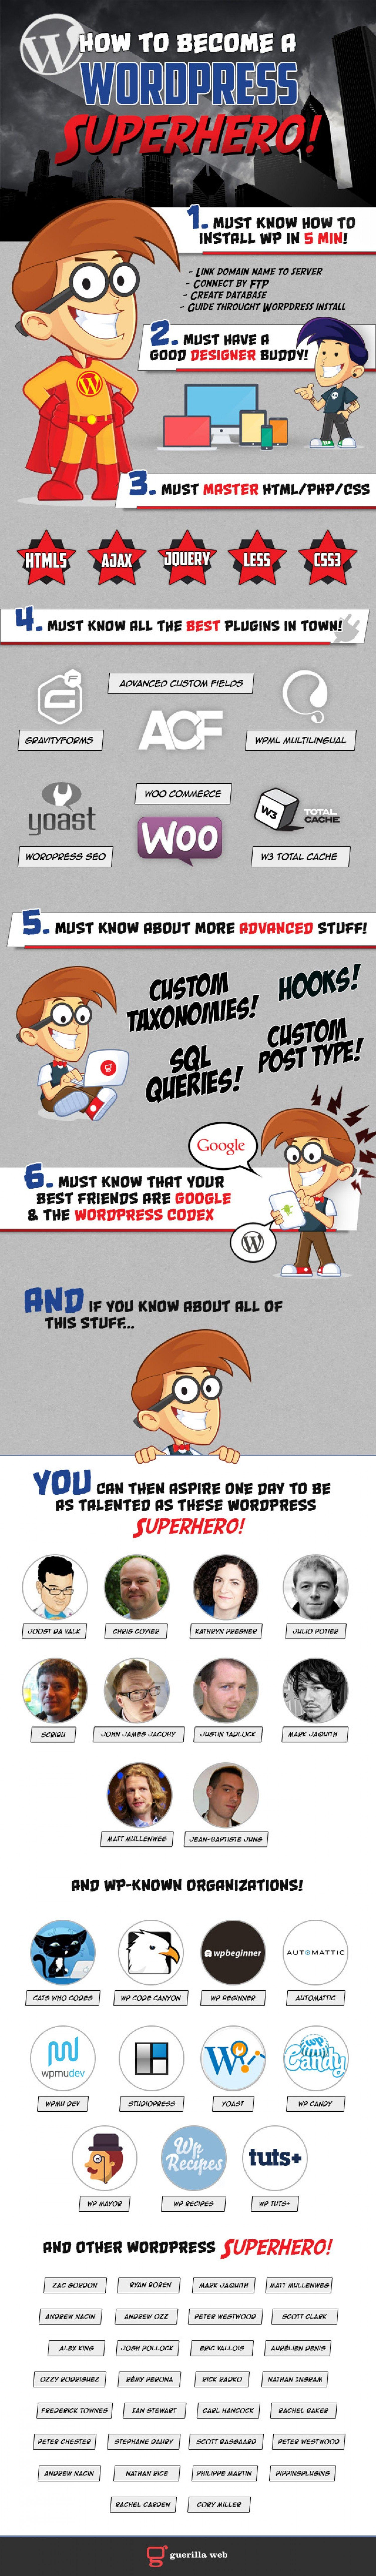 How to Become a #Wordpress Superhero! Infographic